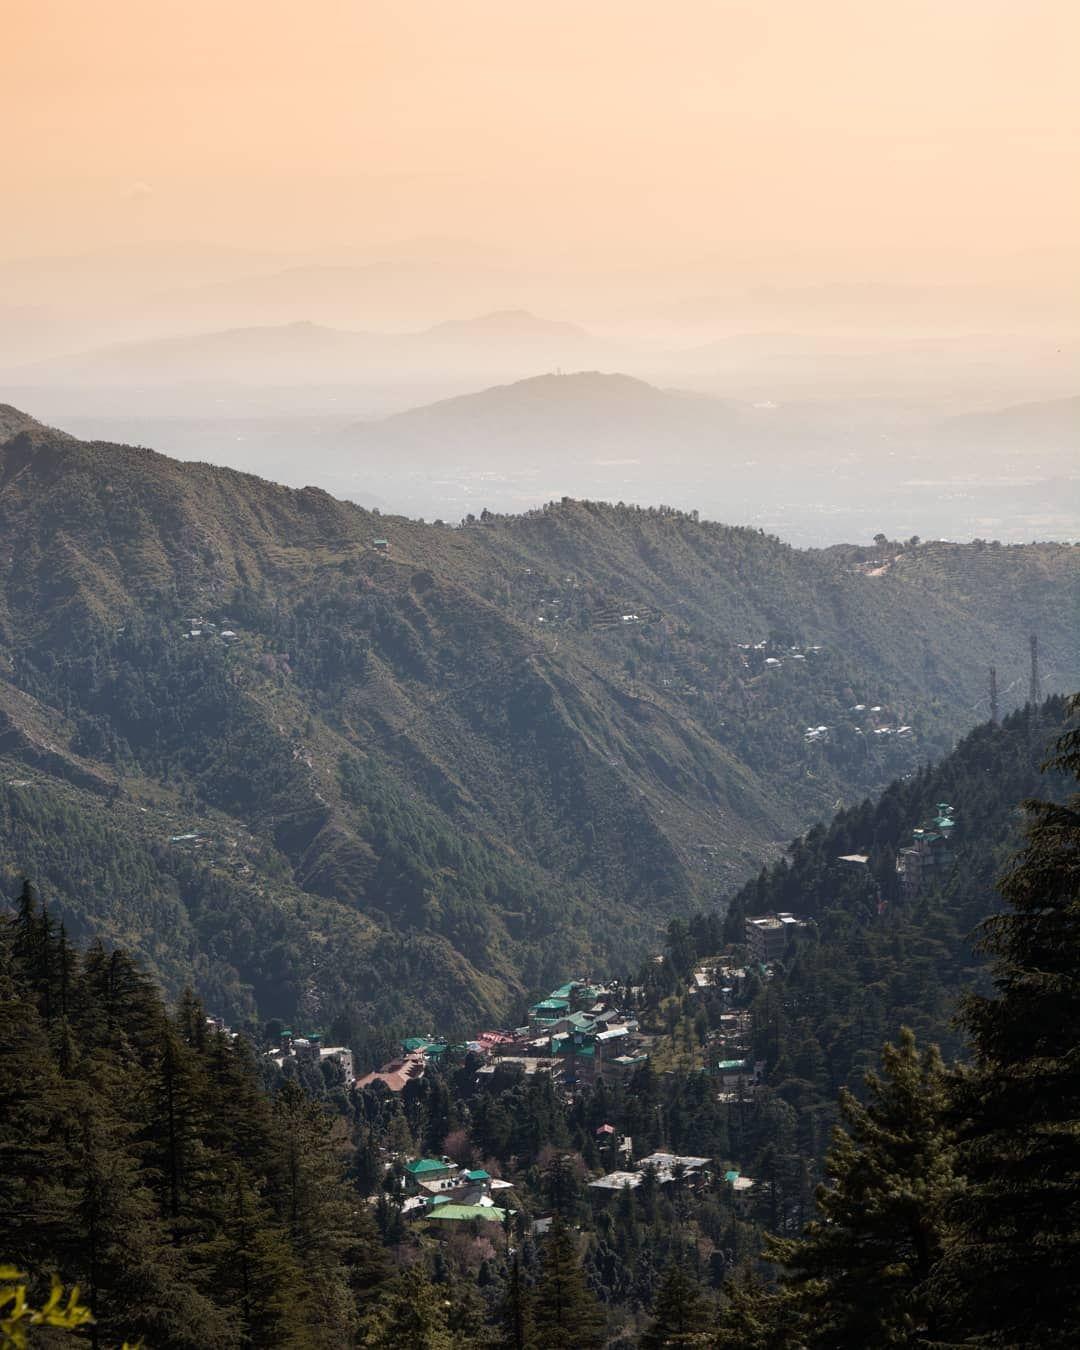 Photo of Triund Trek By sachin chauhan